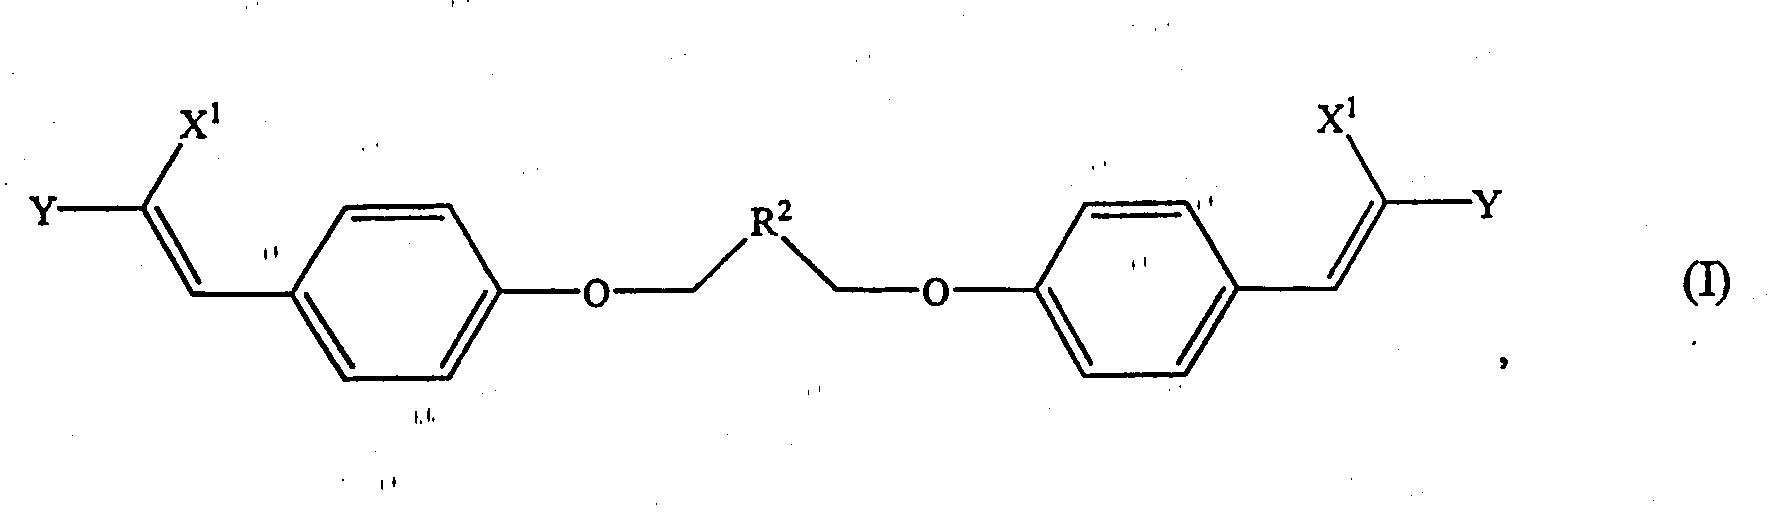 Figure 112004061195235-pct00003